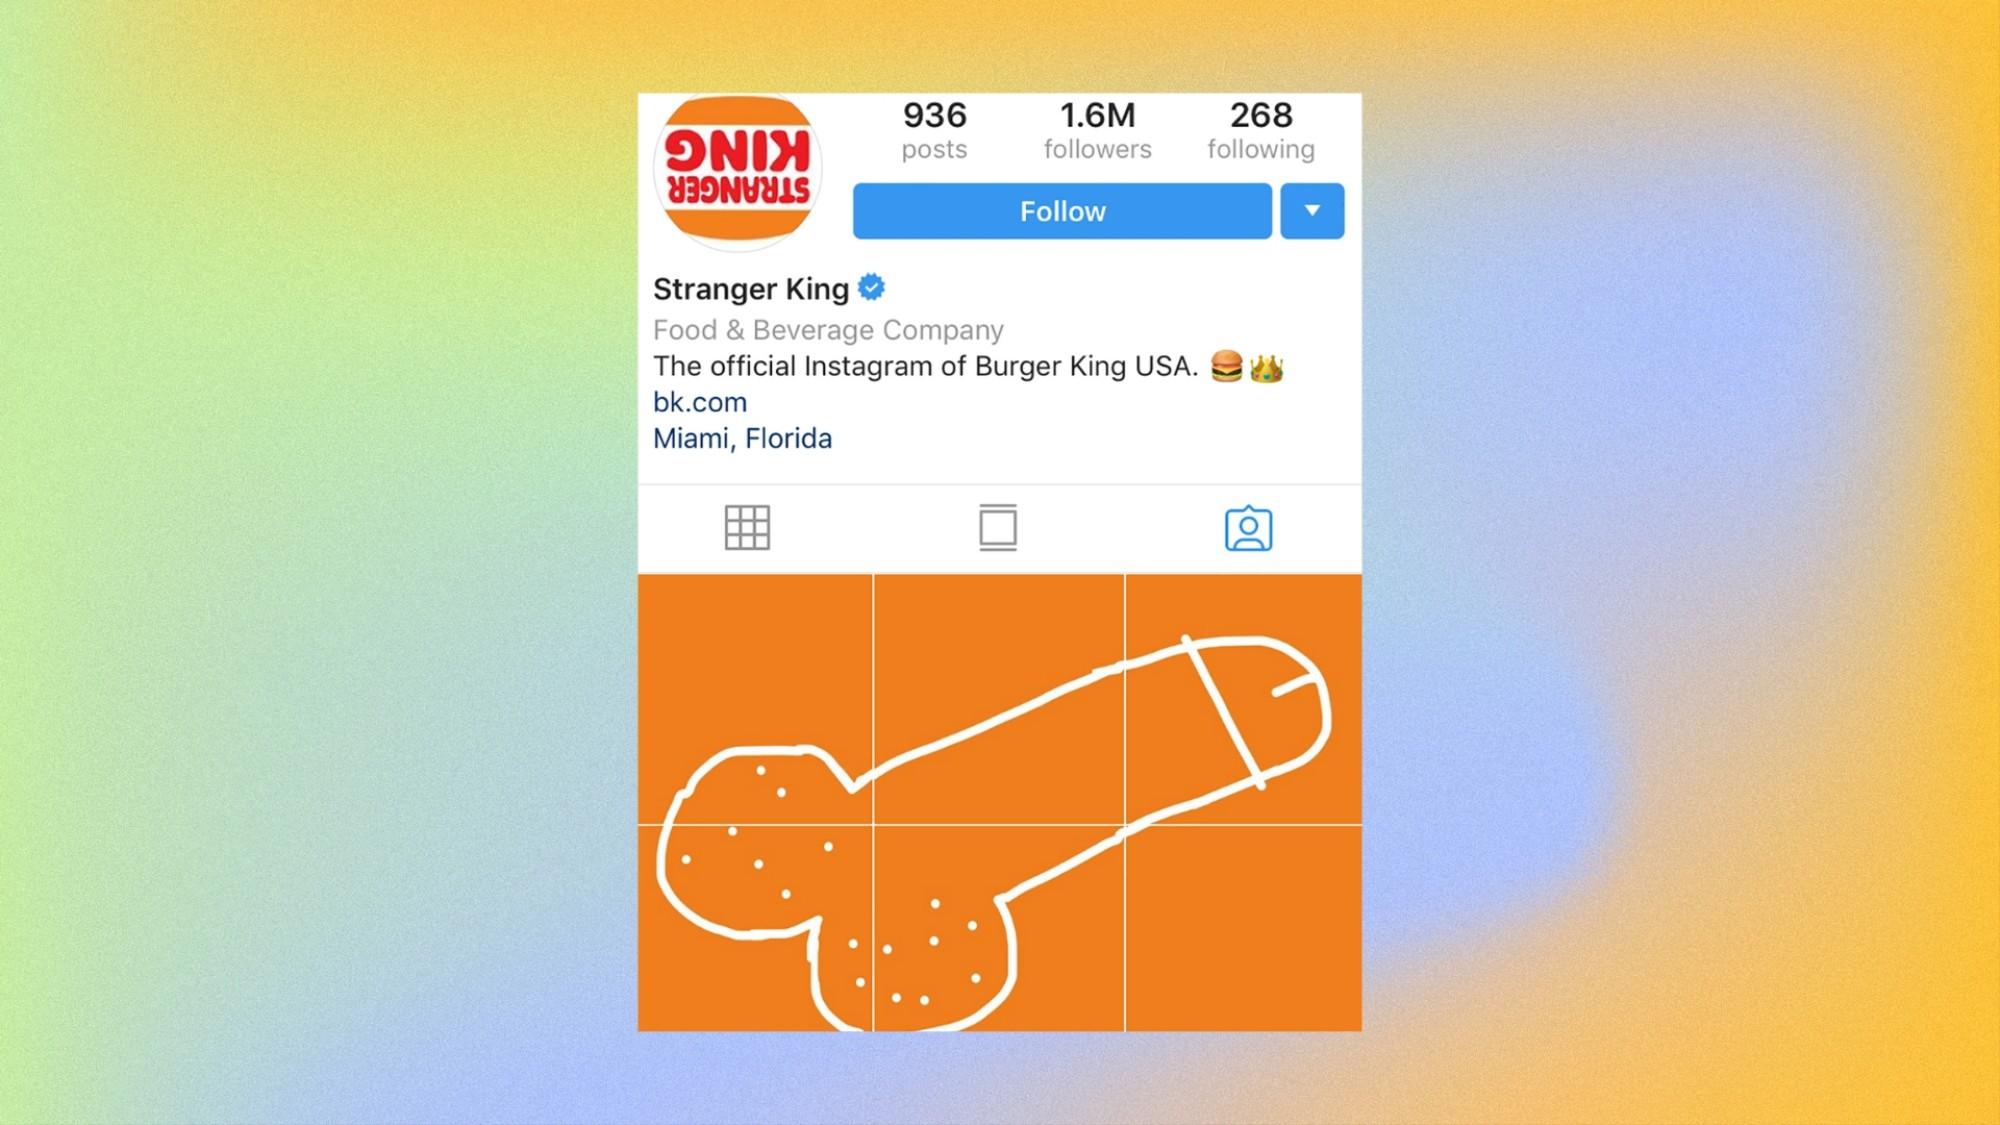 Burger King's Instagram Is Full of Giant Penis Drawings - VICE